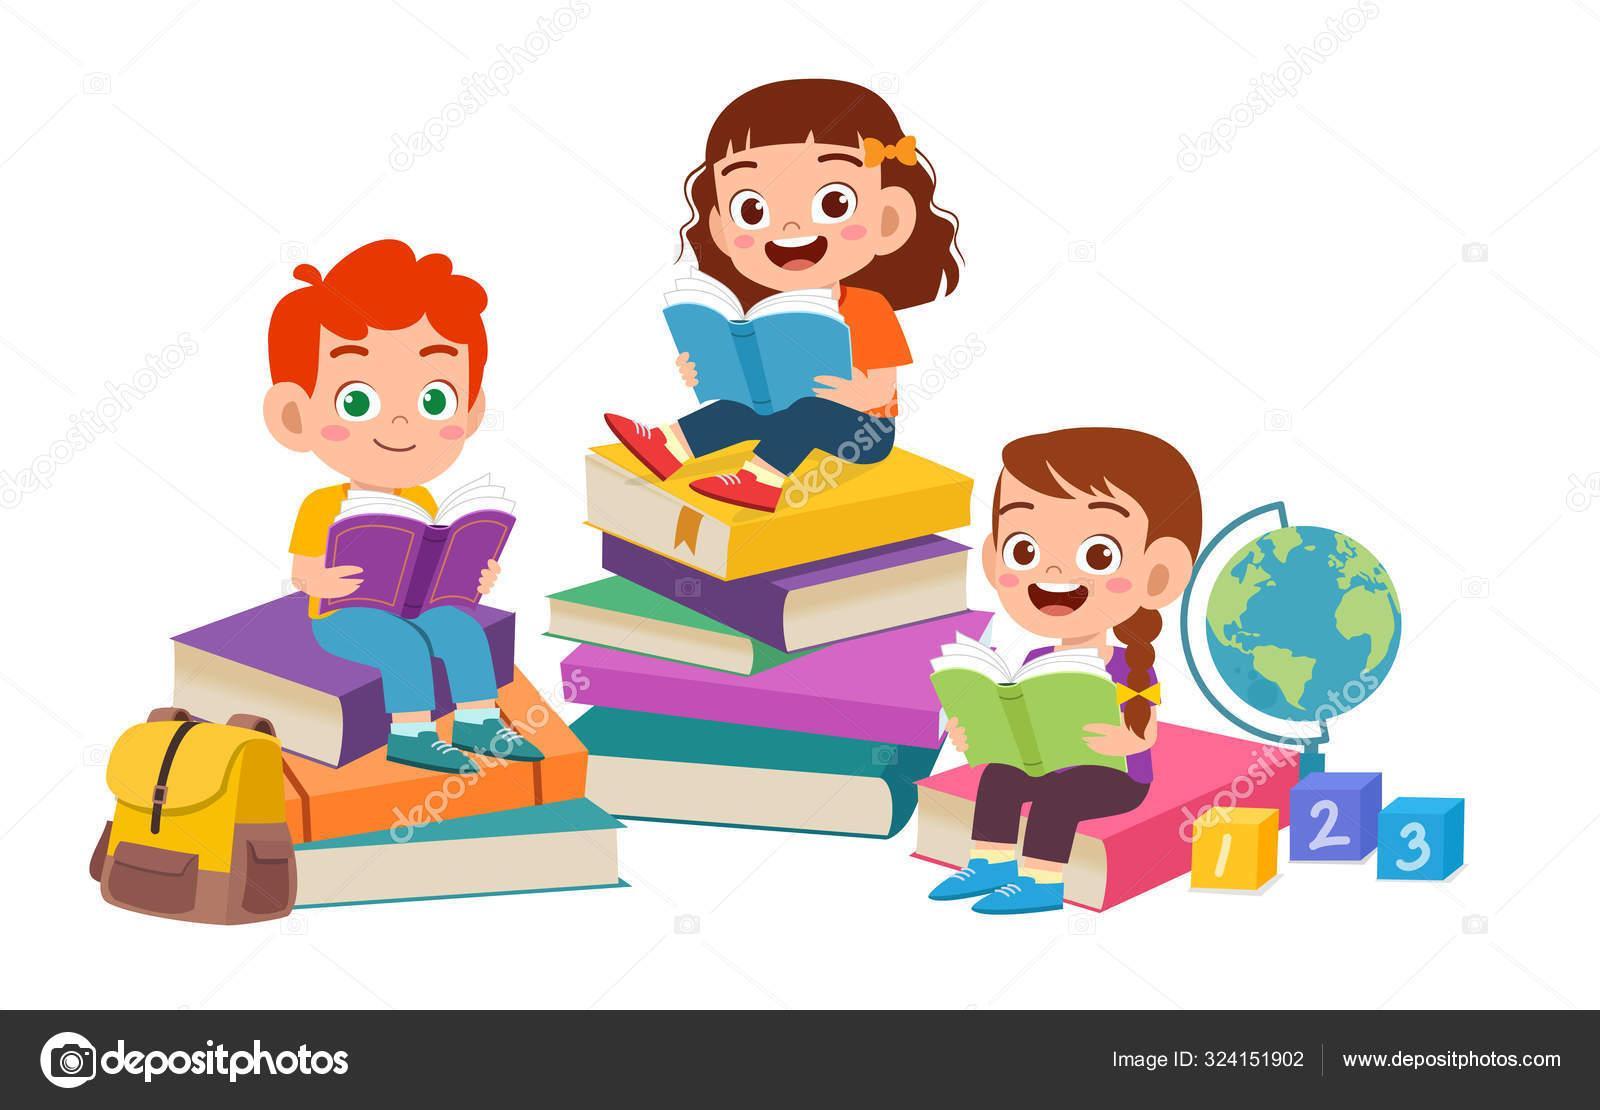 https://st3.depositphotos.com/27811286/32415/v/1600/depositphotos_324151902-stock-illustration-happy-cute-kids-boy-and.jpg